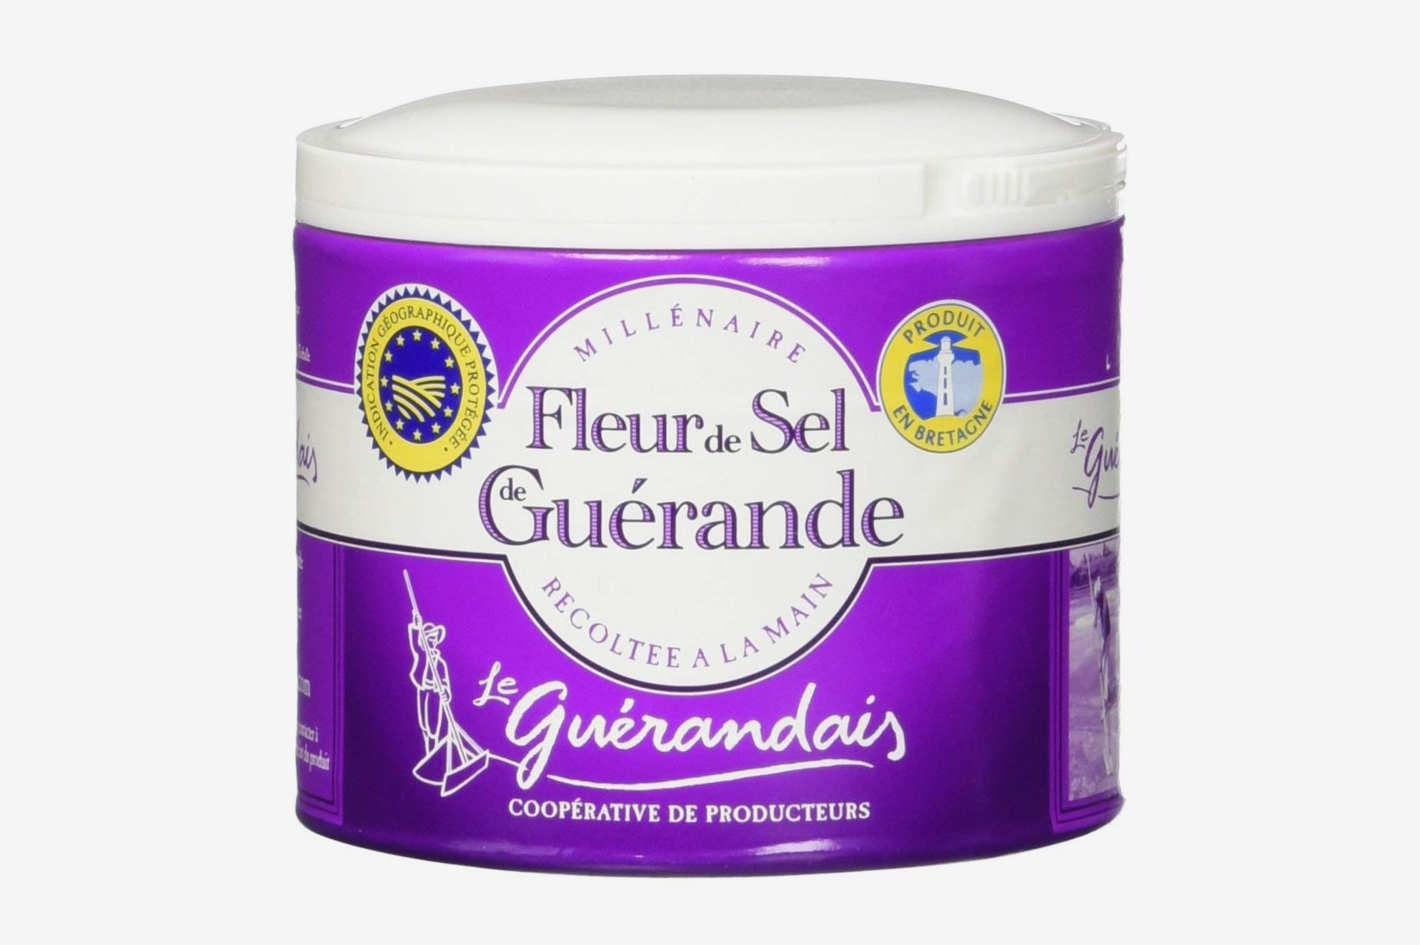 Fleur de sel de Guérande (Pack of 2)